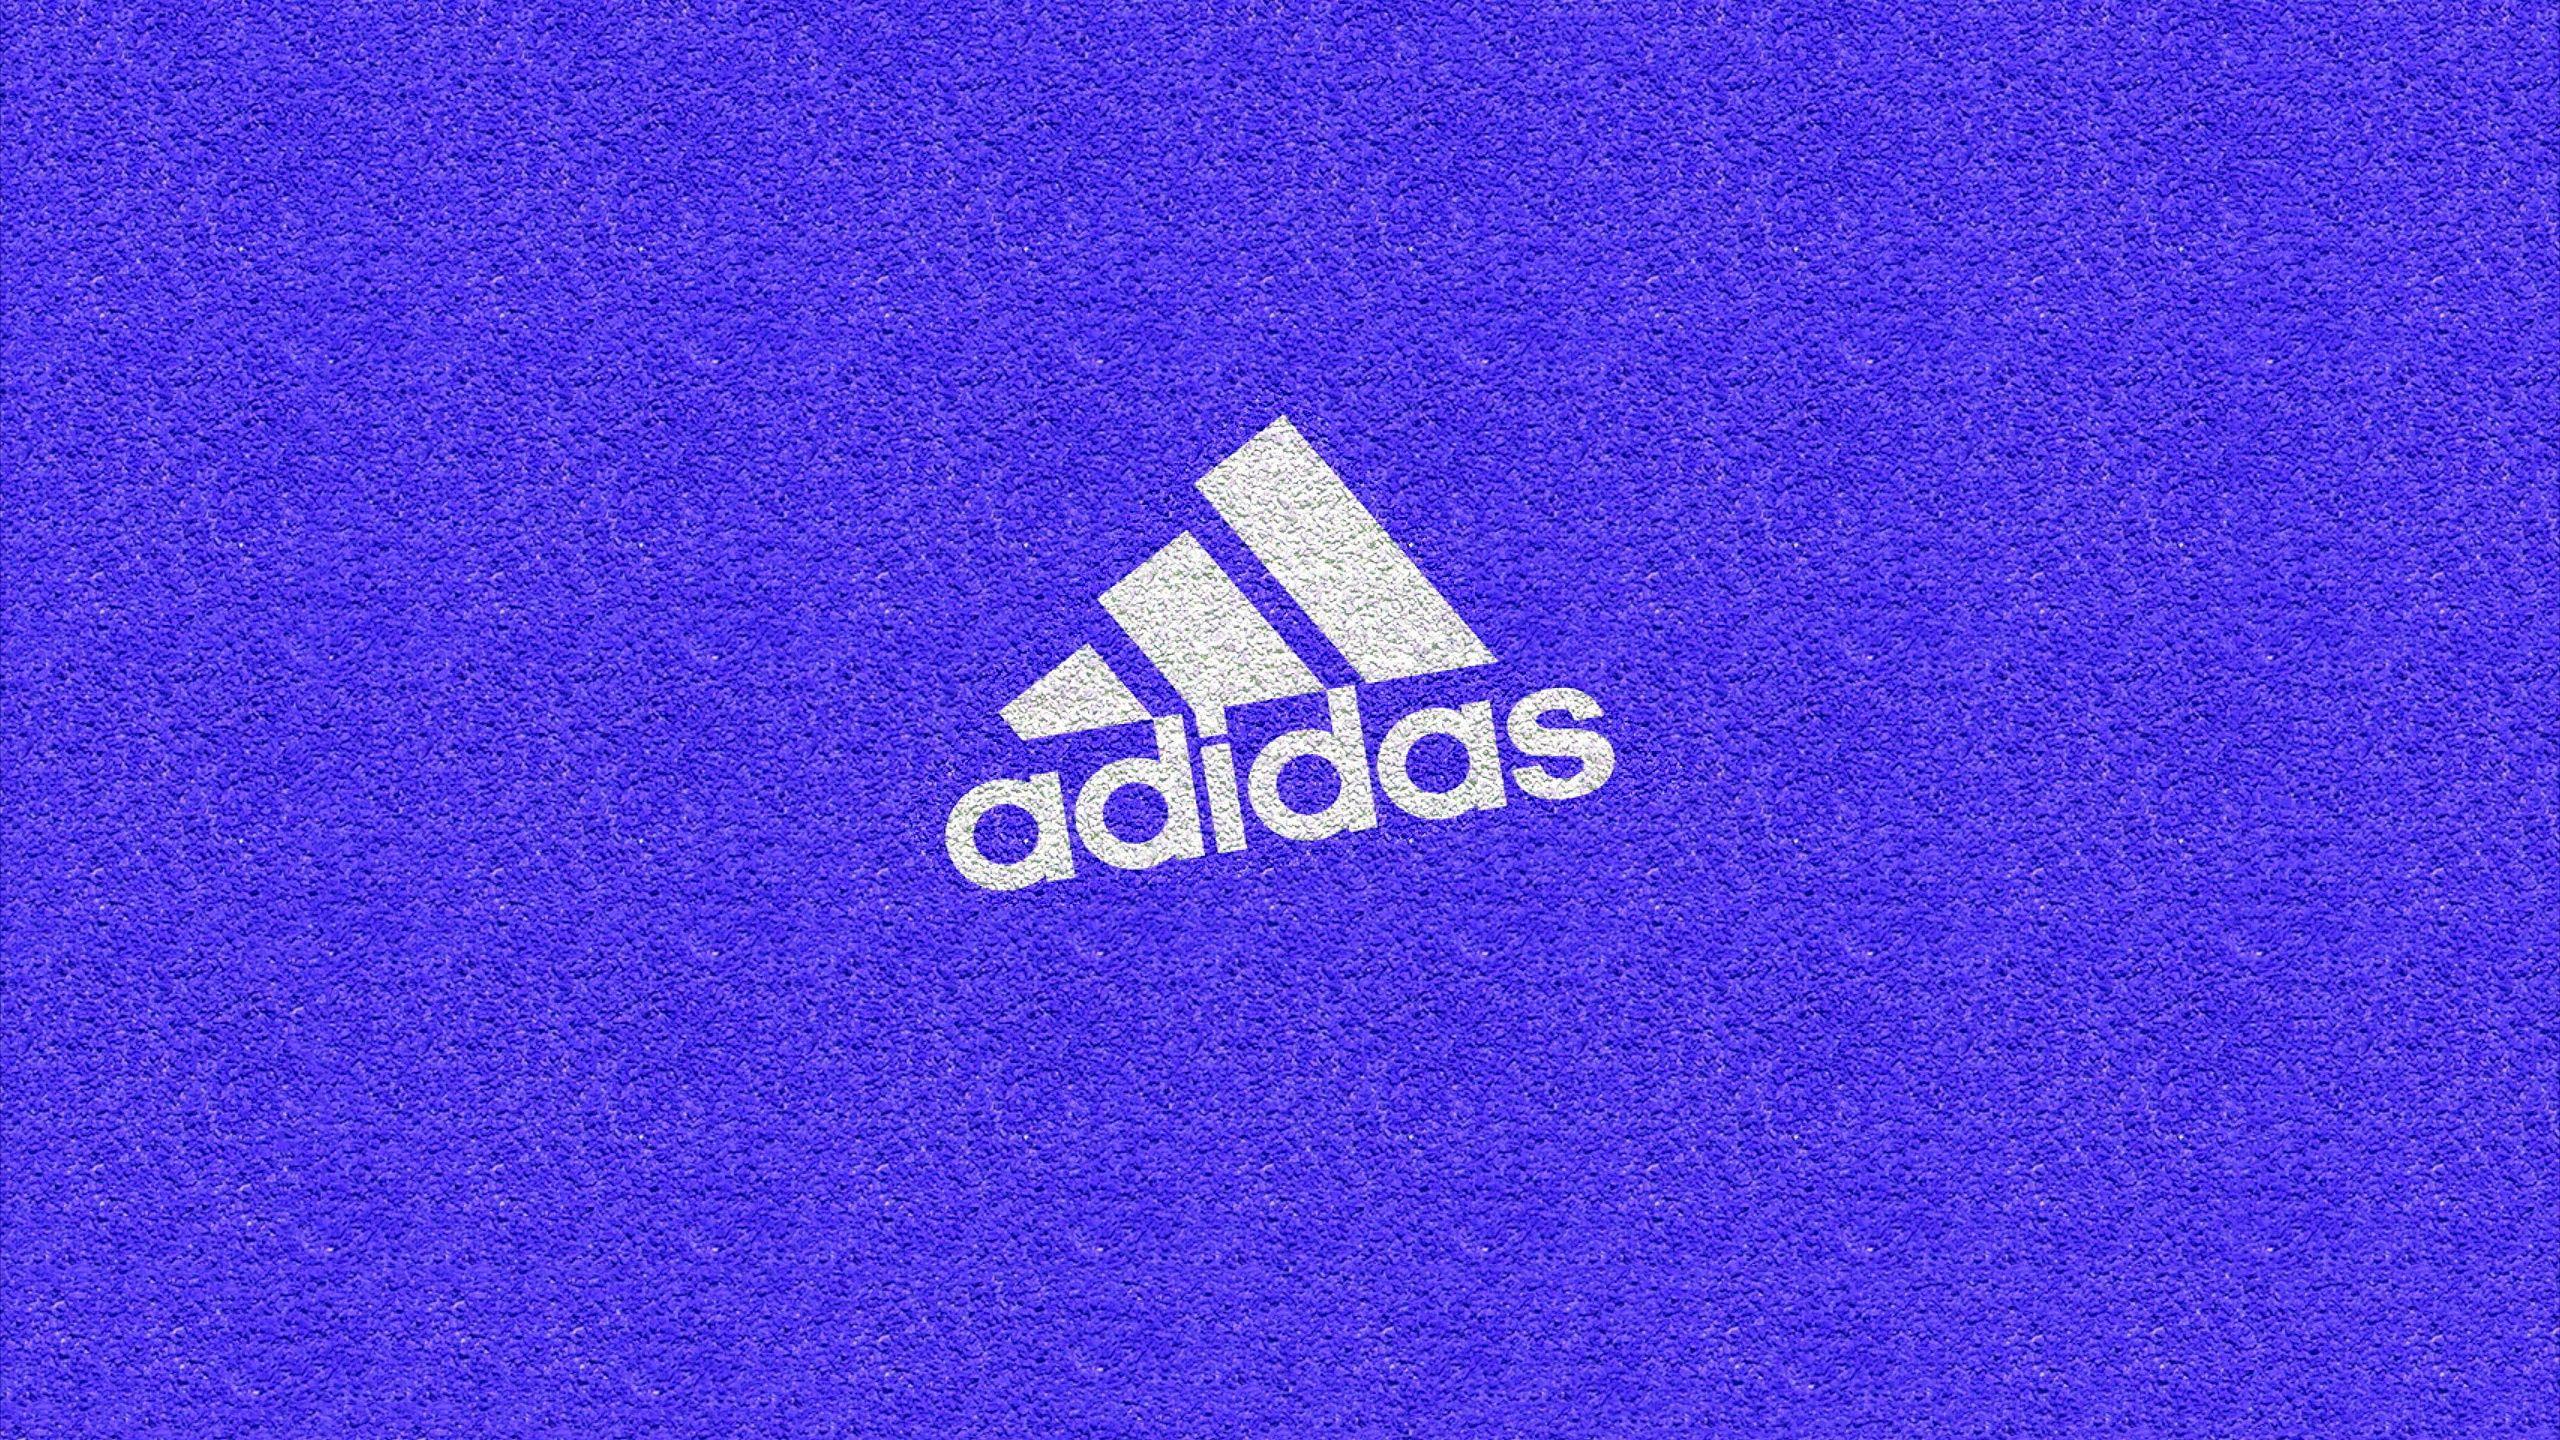 cool adidas wallpapers, adidas soccer wallpaper